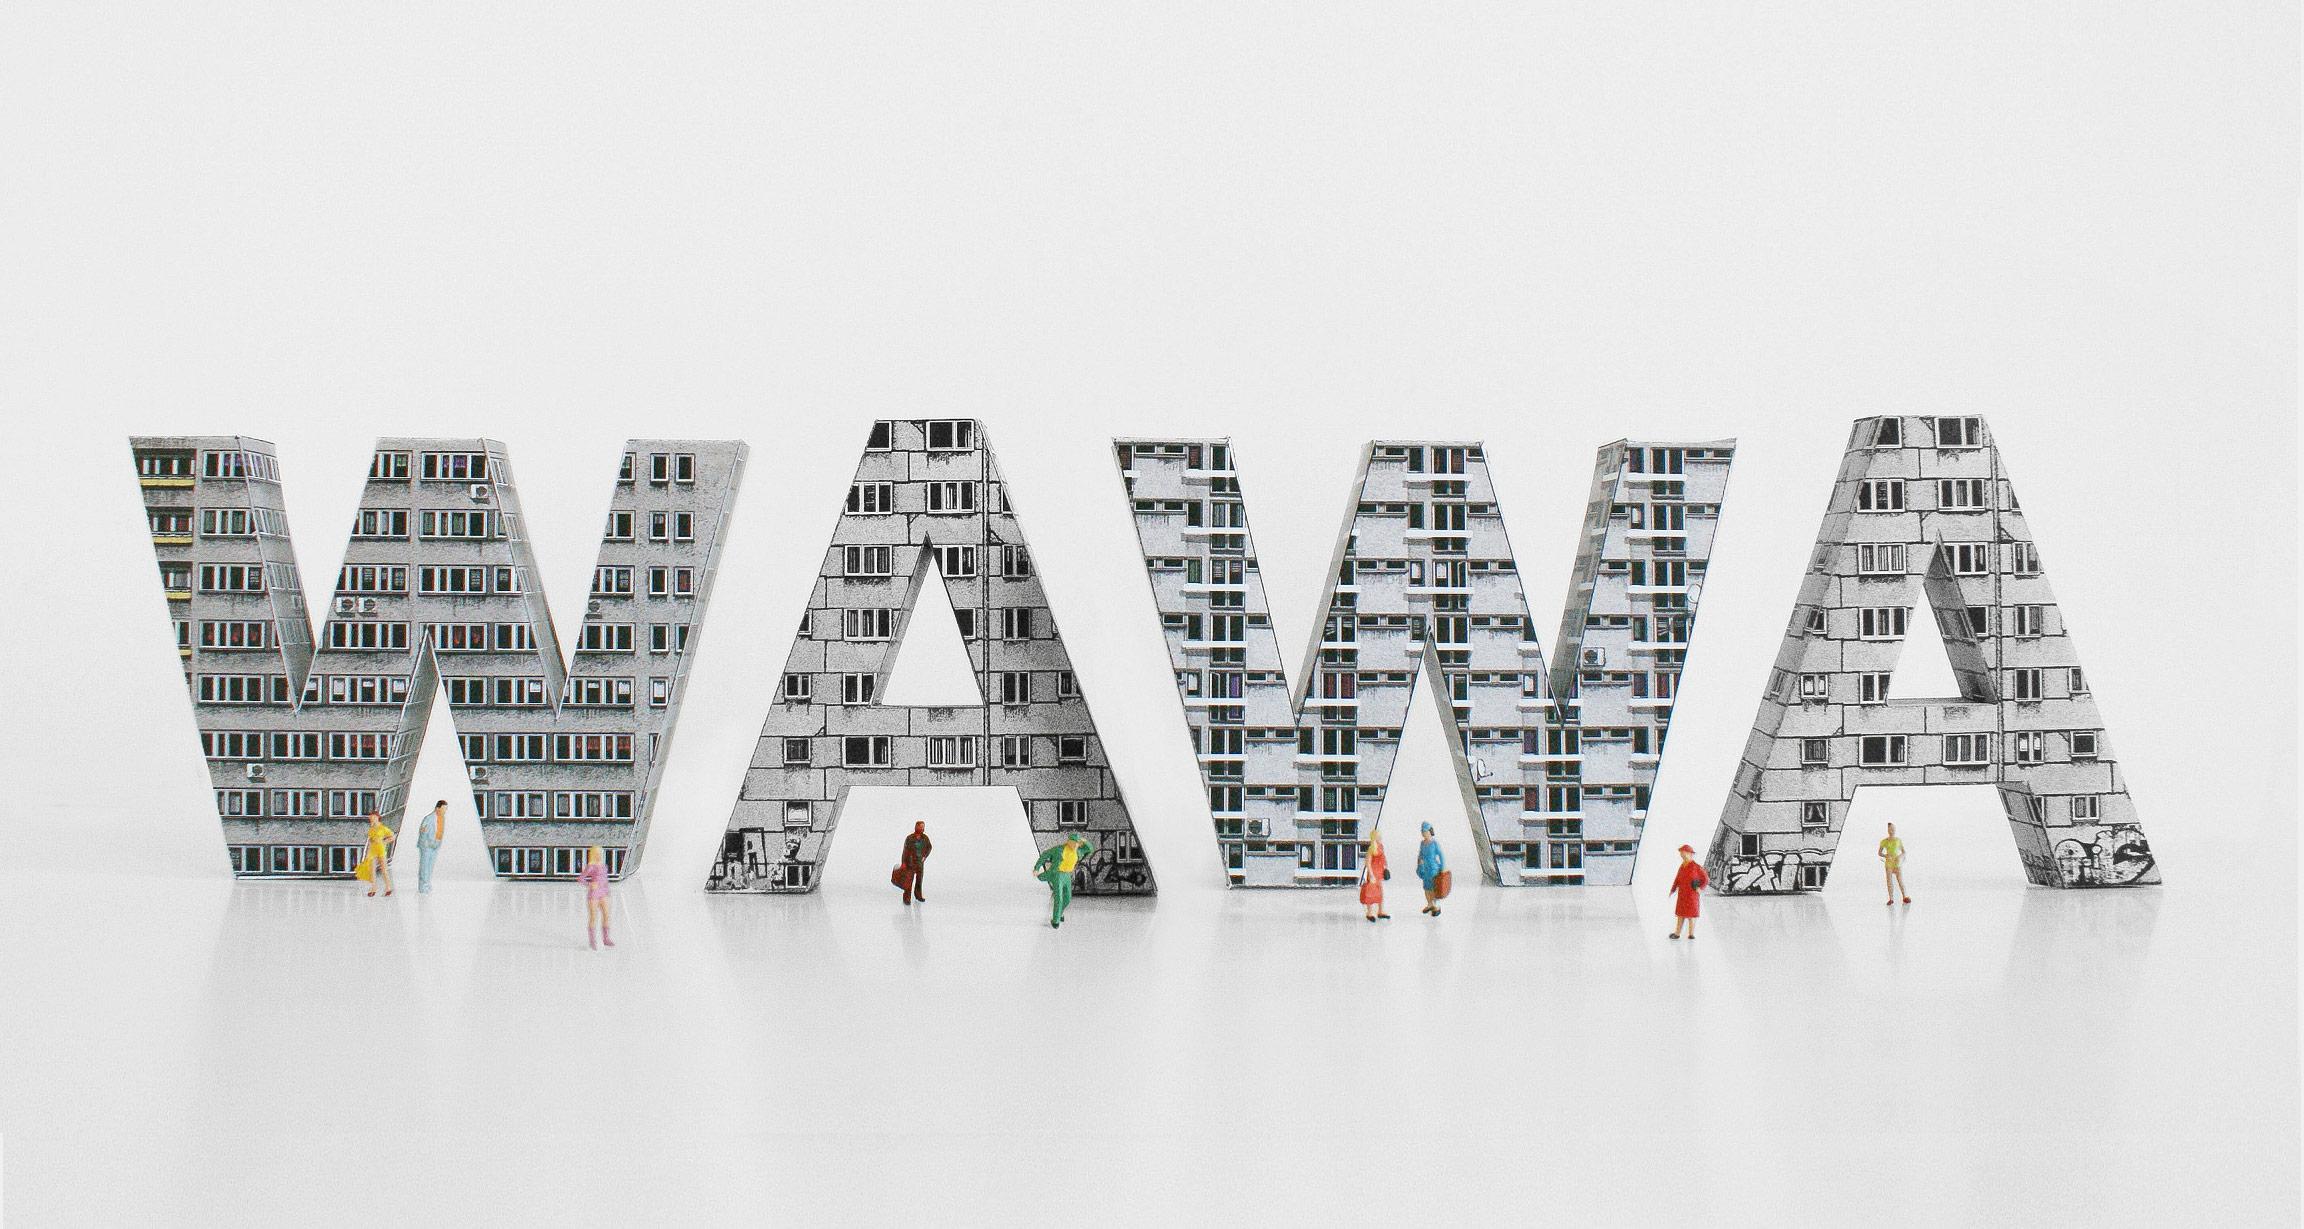 Blokografia: The Polish Modernist Typography